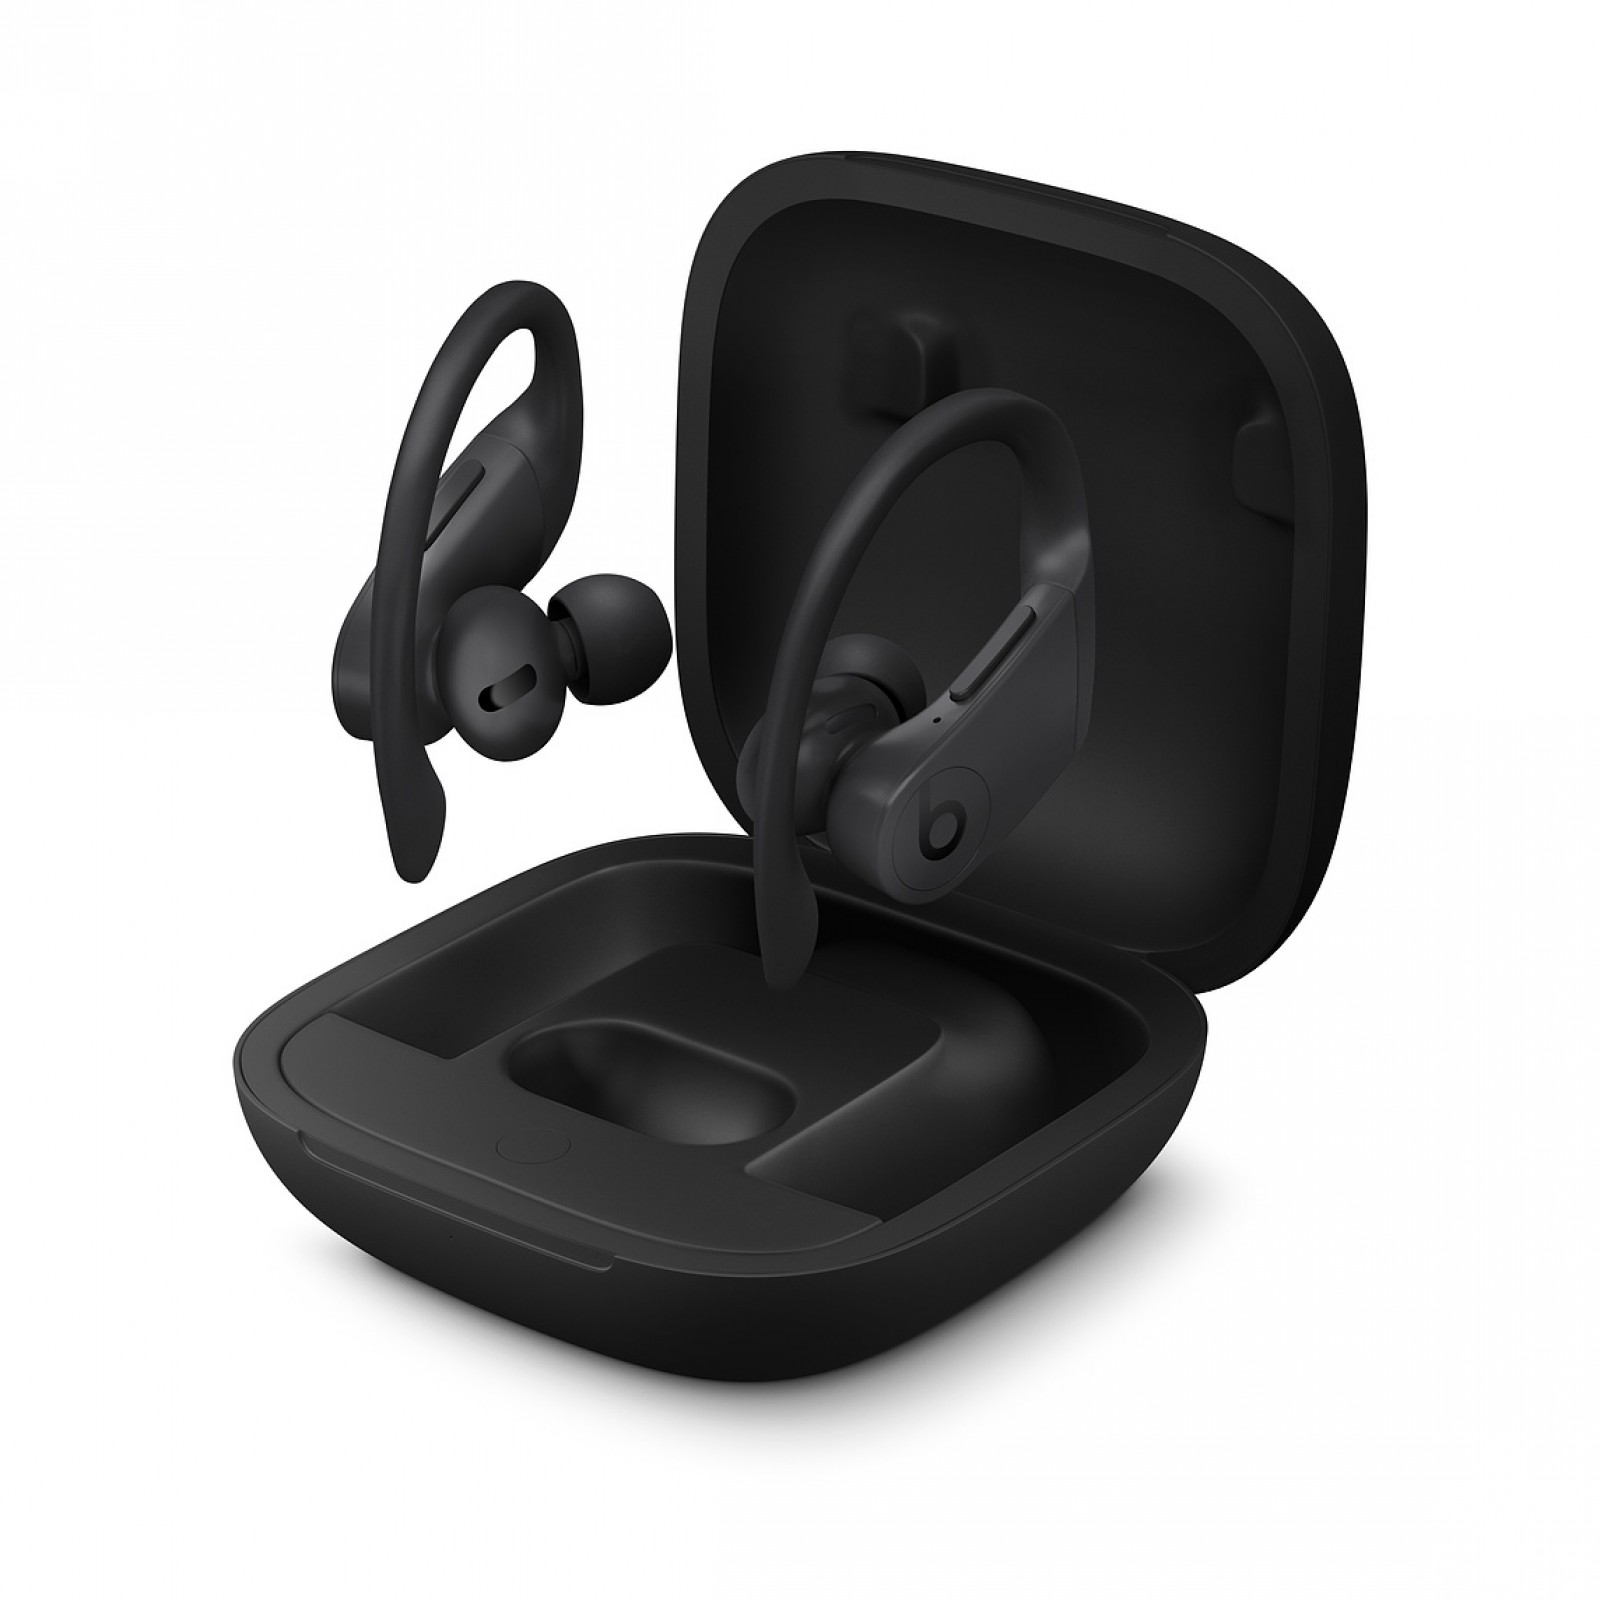 Powerbeats Pro - Totally Wireless - Black